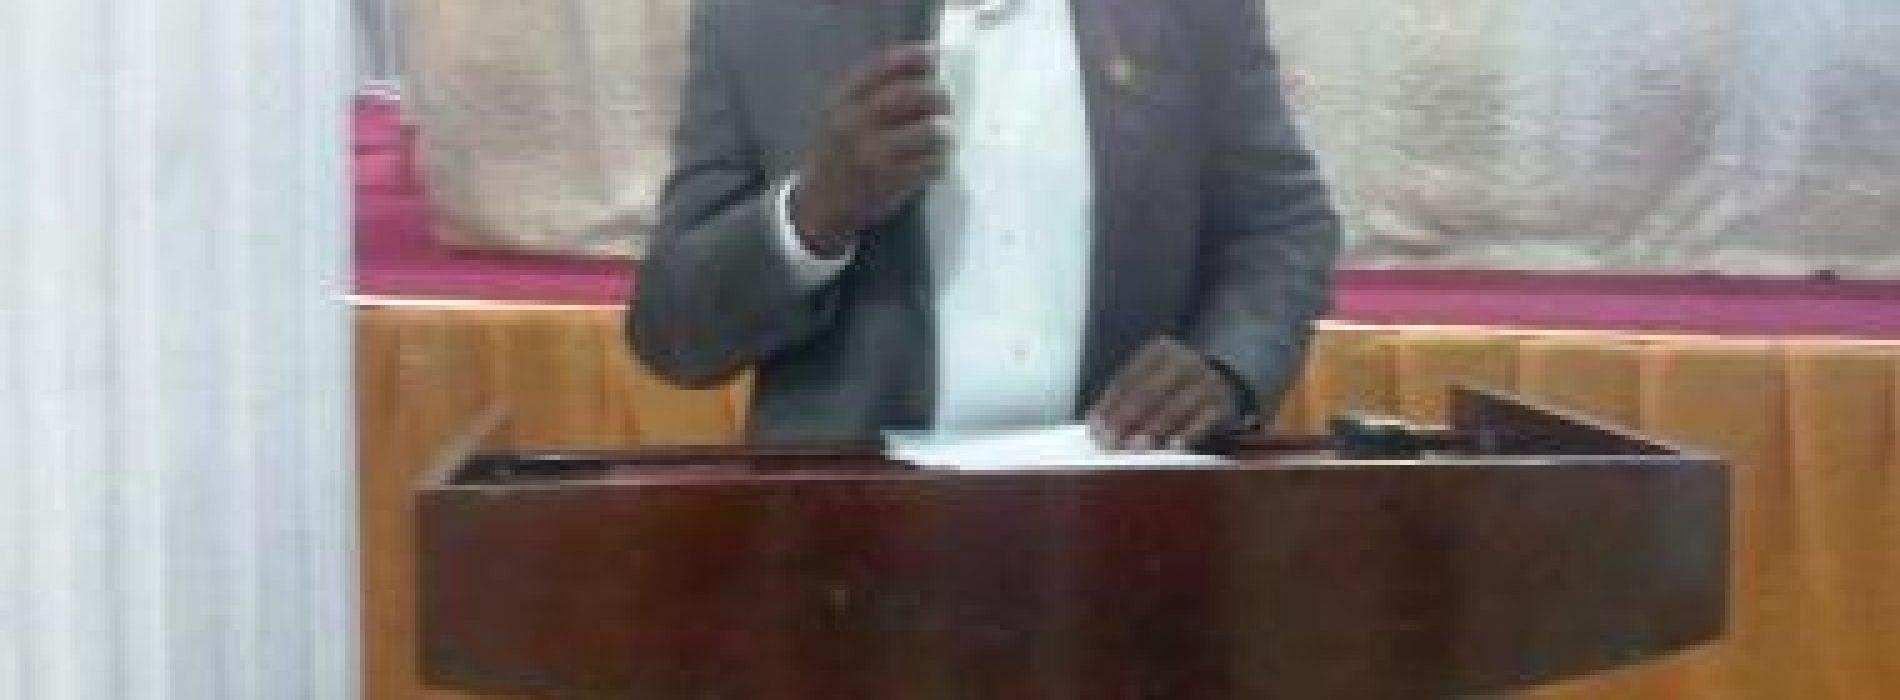 Help improve healthcare standard, Lagos Health Commissioner urges doctors